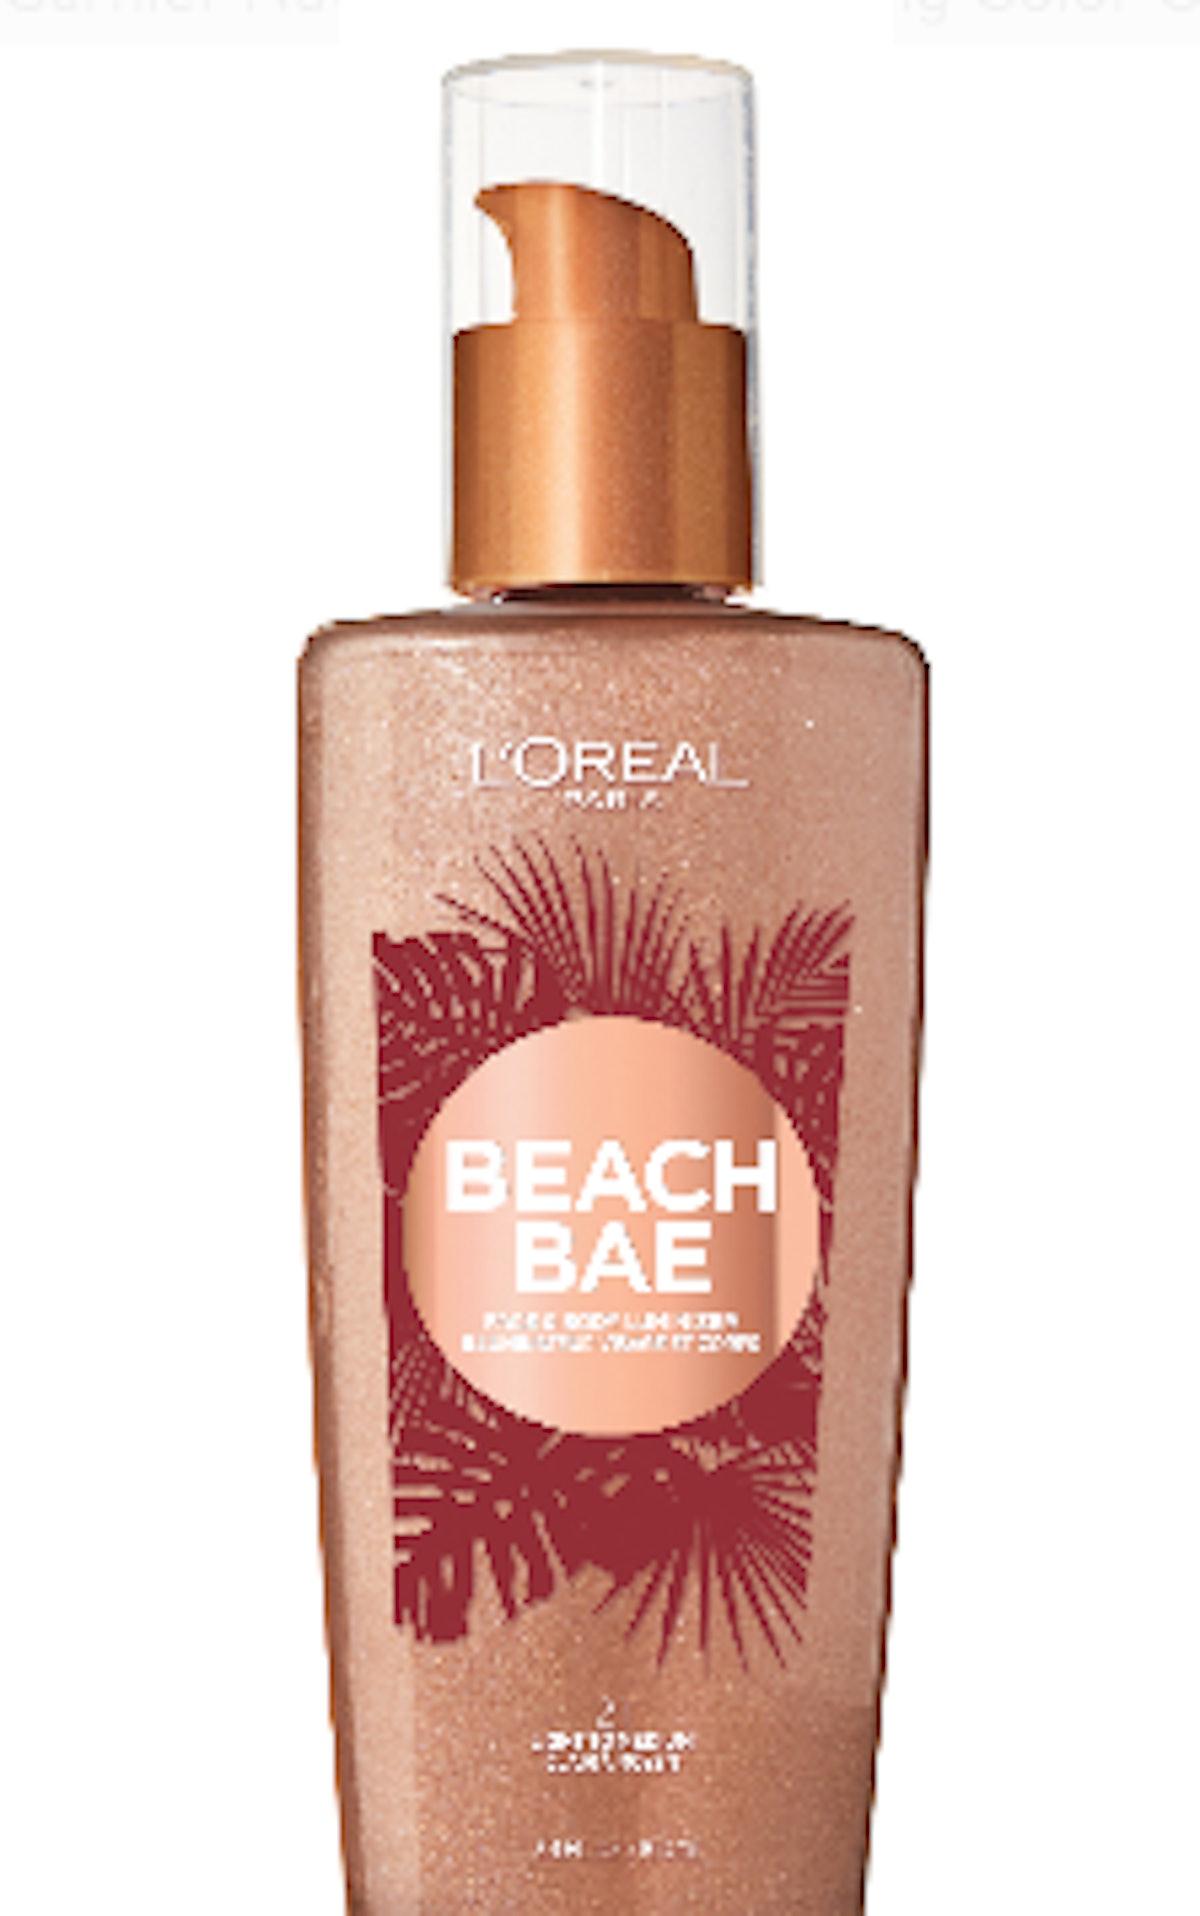 L'Oreal Paris Summer Belle Beach Bae Face & Body Liquid Luminizer